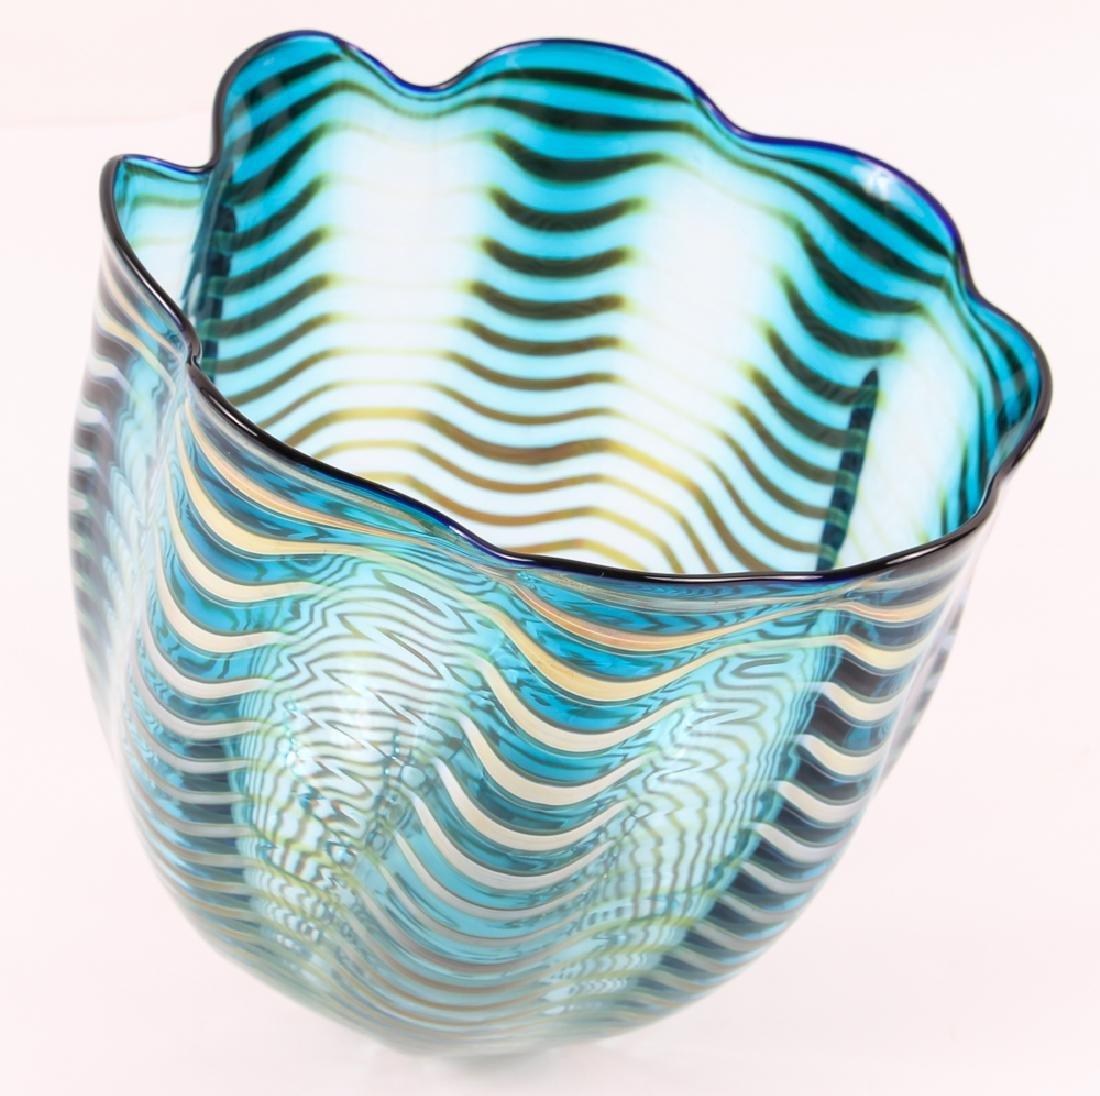 DALE CHIHULY; PORTLAND PRESS Blown glass Seaform vase - 3